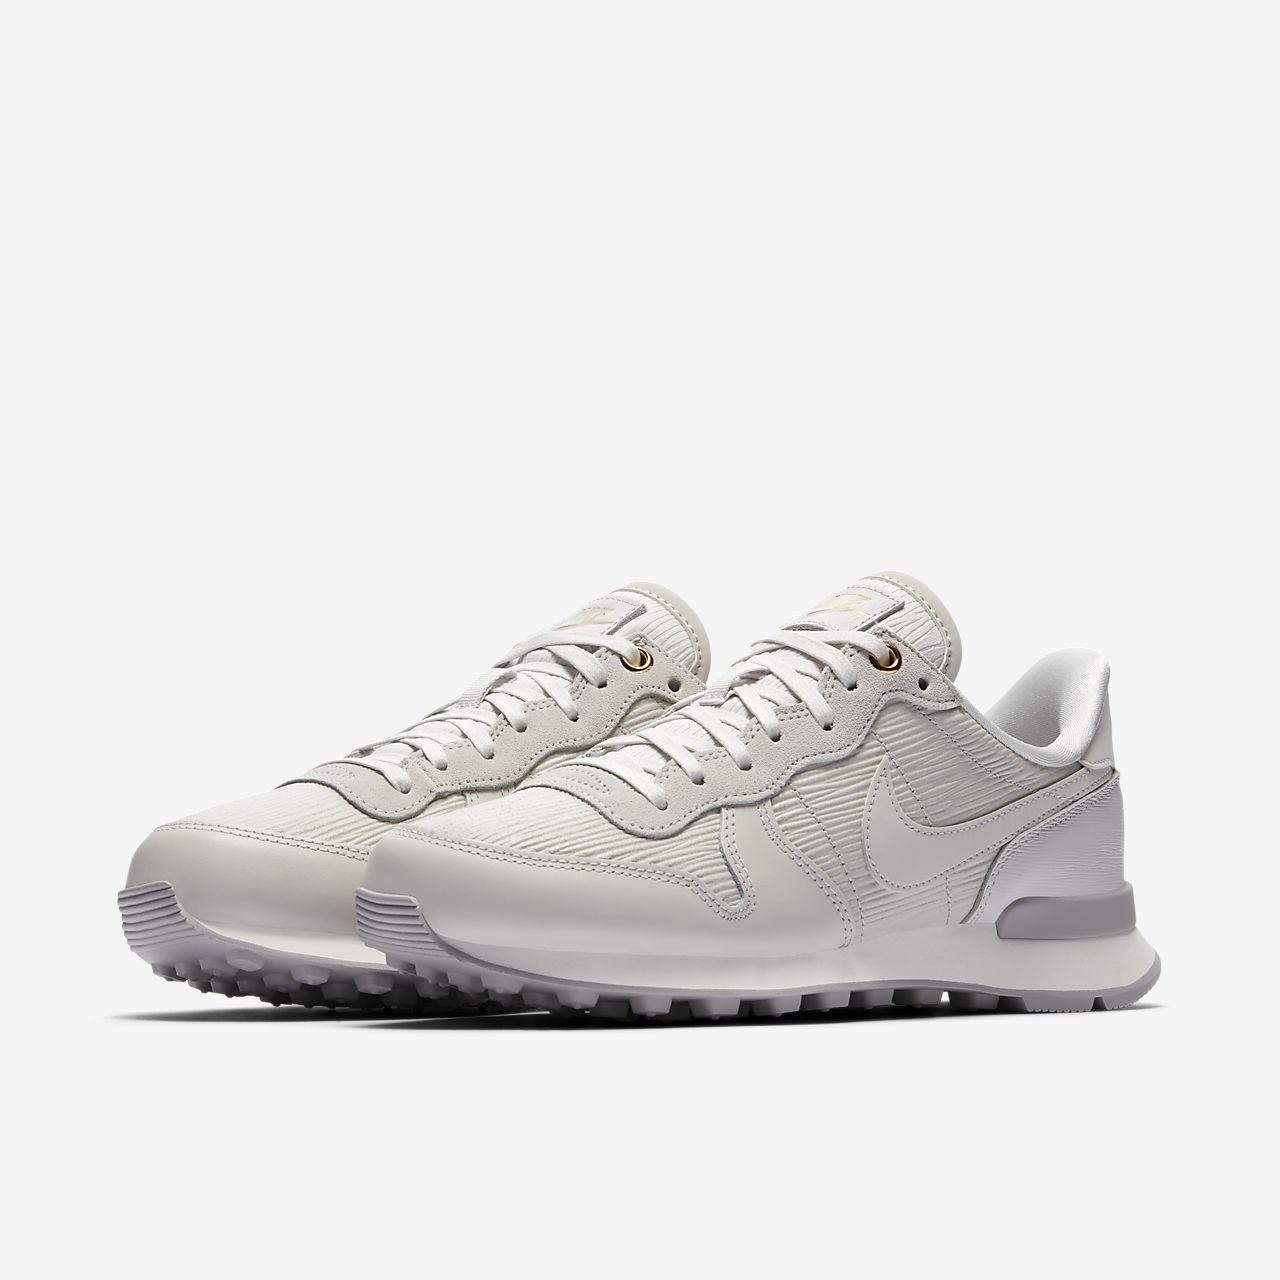 Nike Wmns Bas Femmes Haut Internationaliste - Esprit - 38,5 Eu